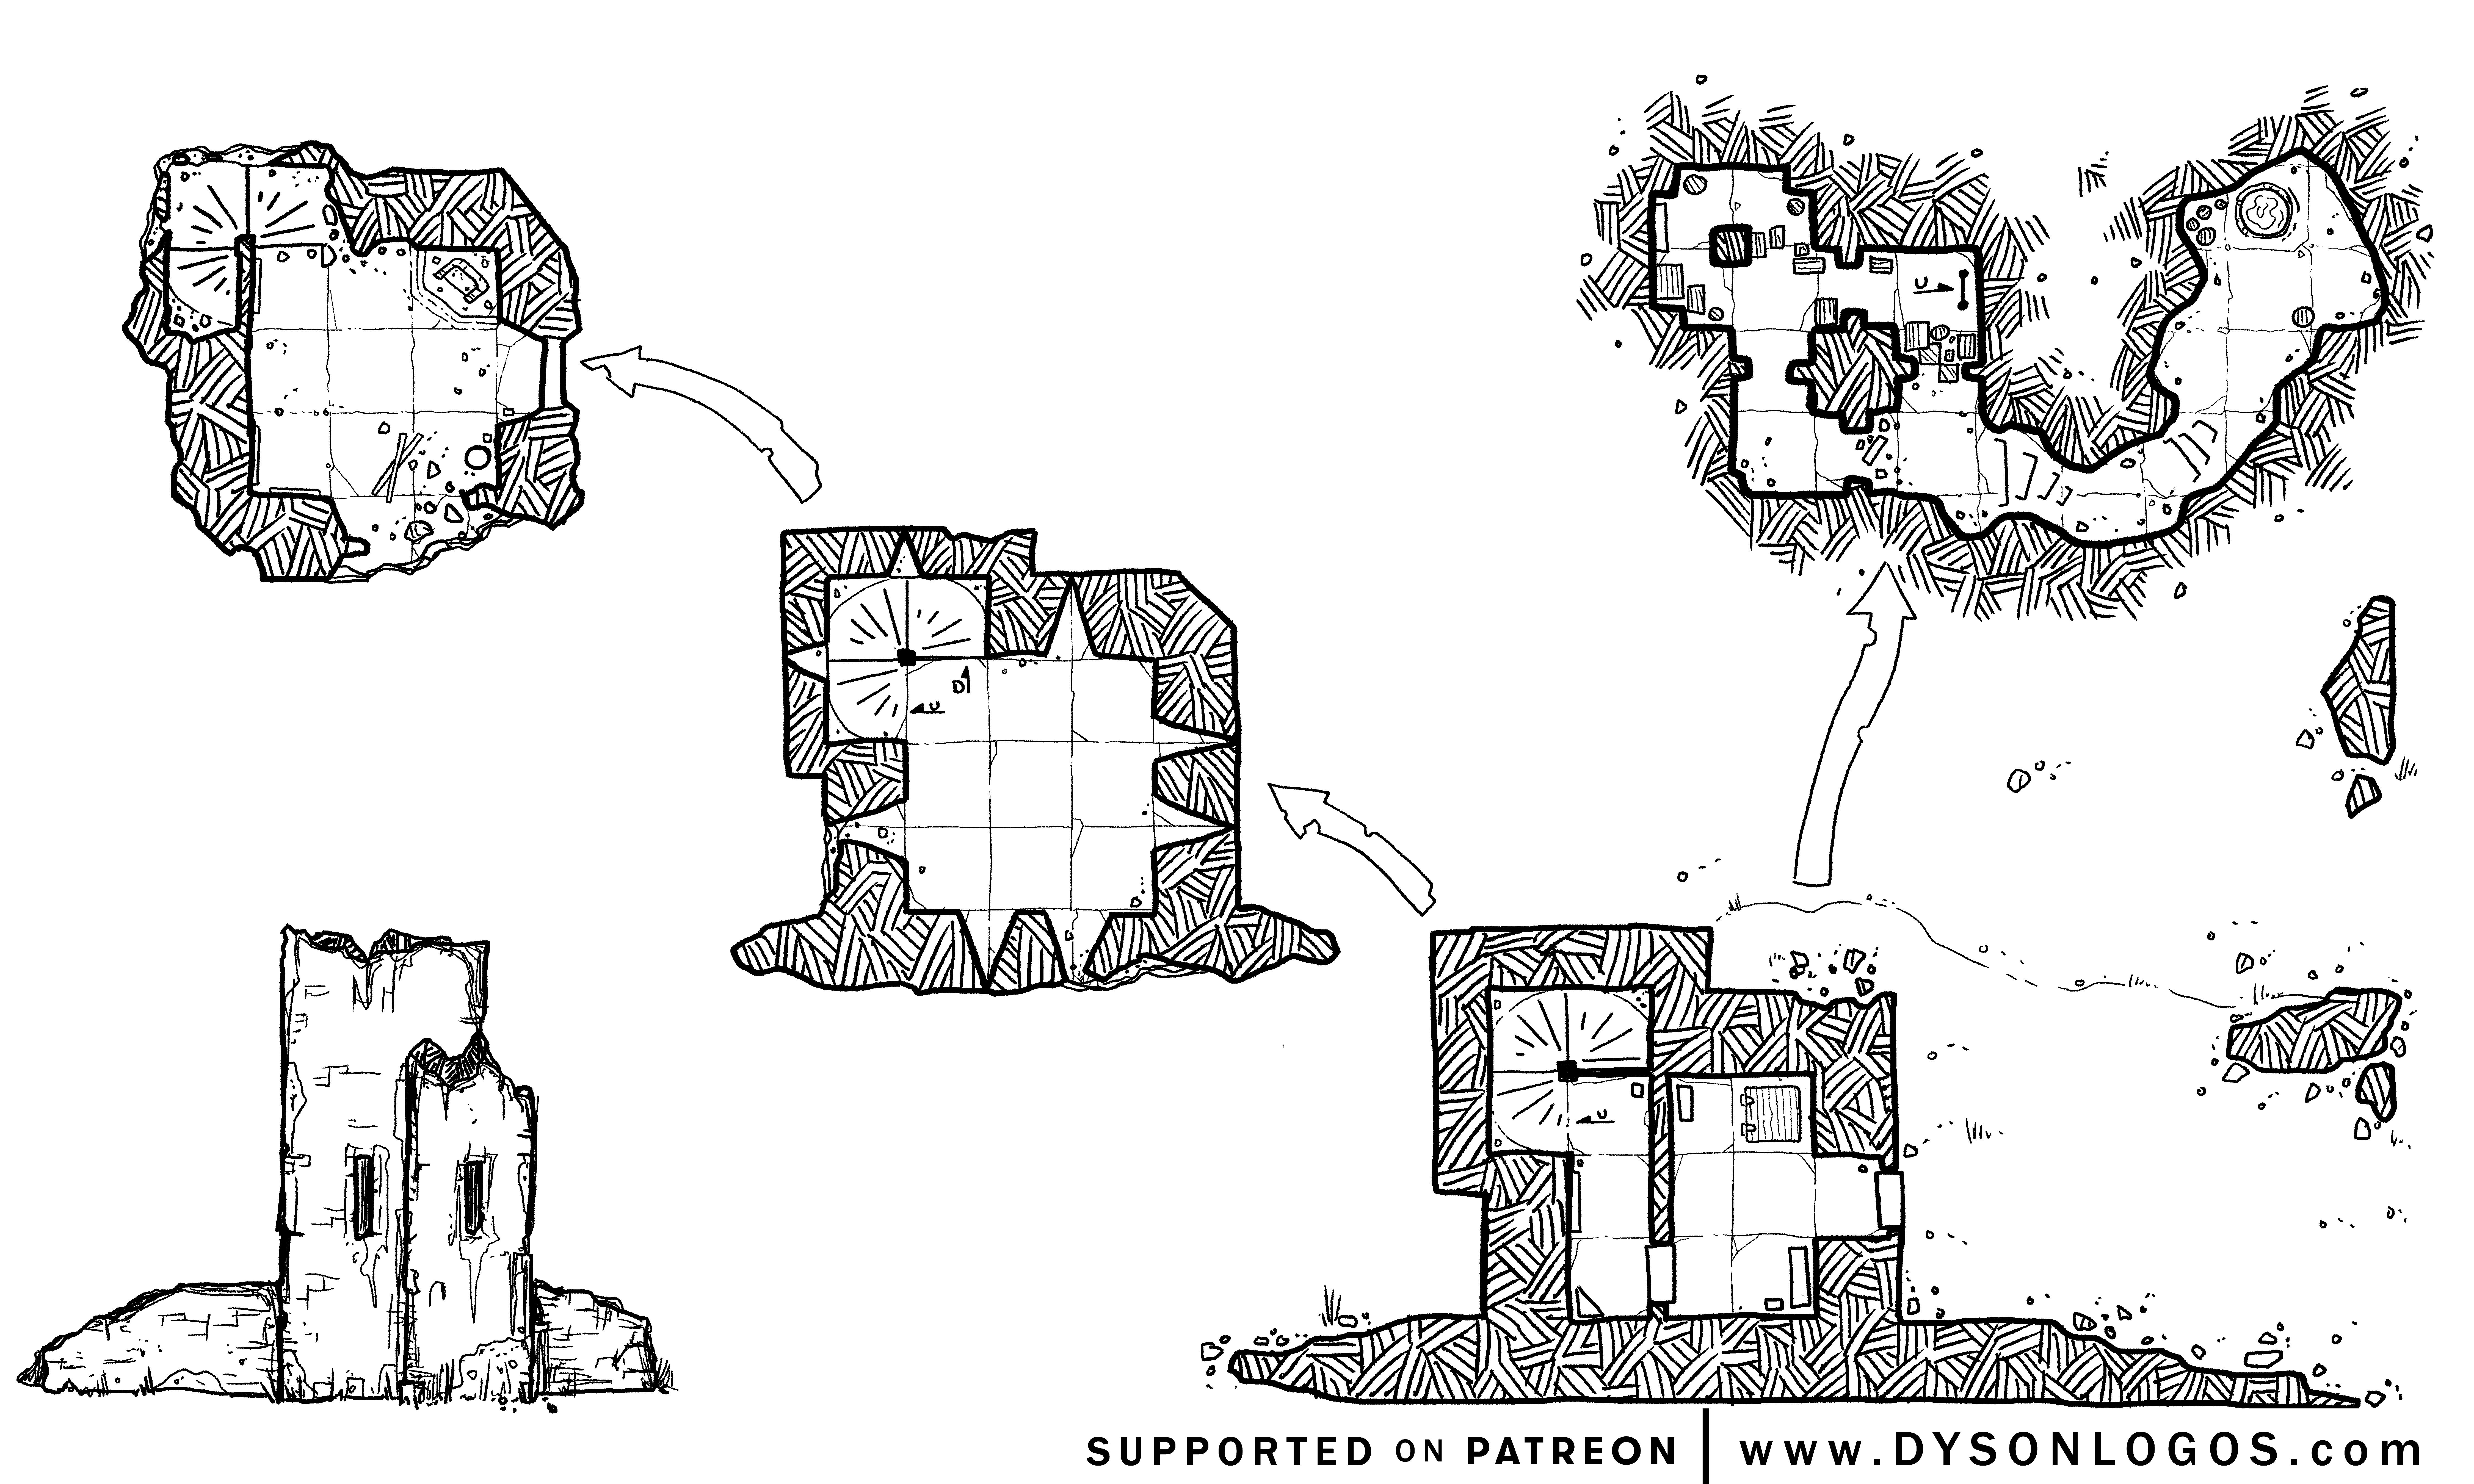 The ruins of Boar Isle Tower (1200 dpi)